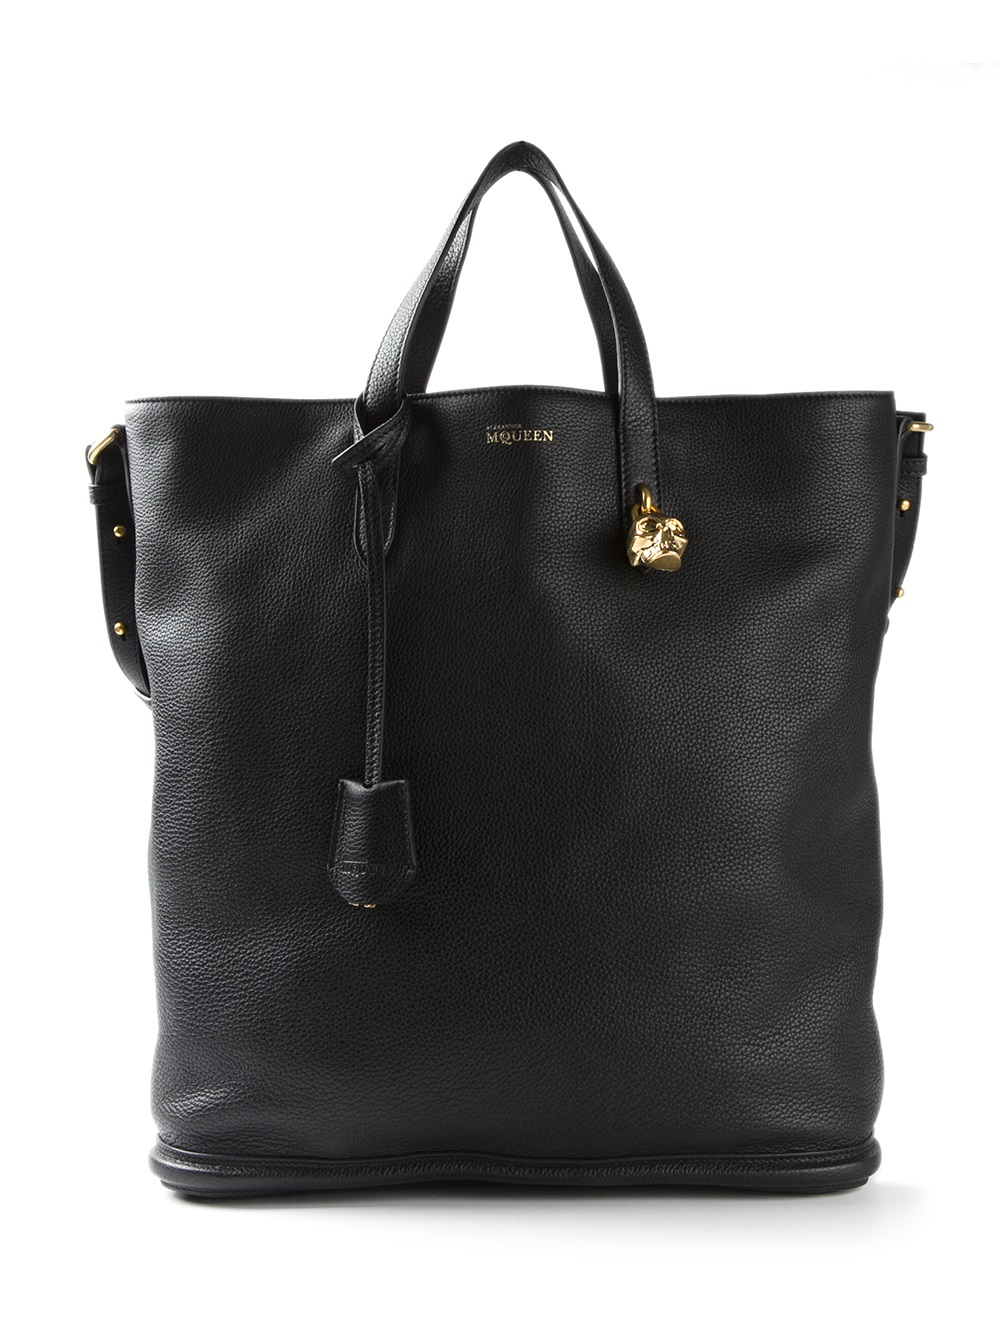 Alexander Mcqueen Large Shopper Bag In Black Lyst